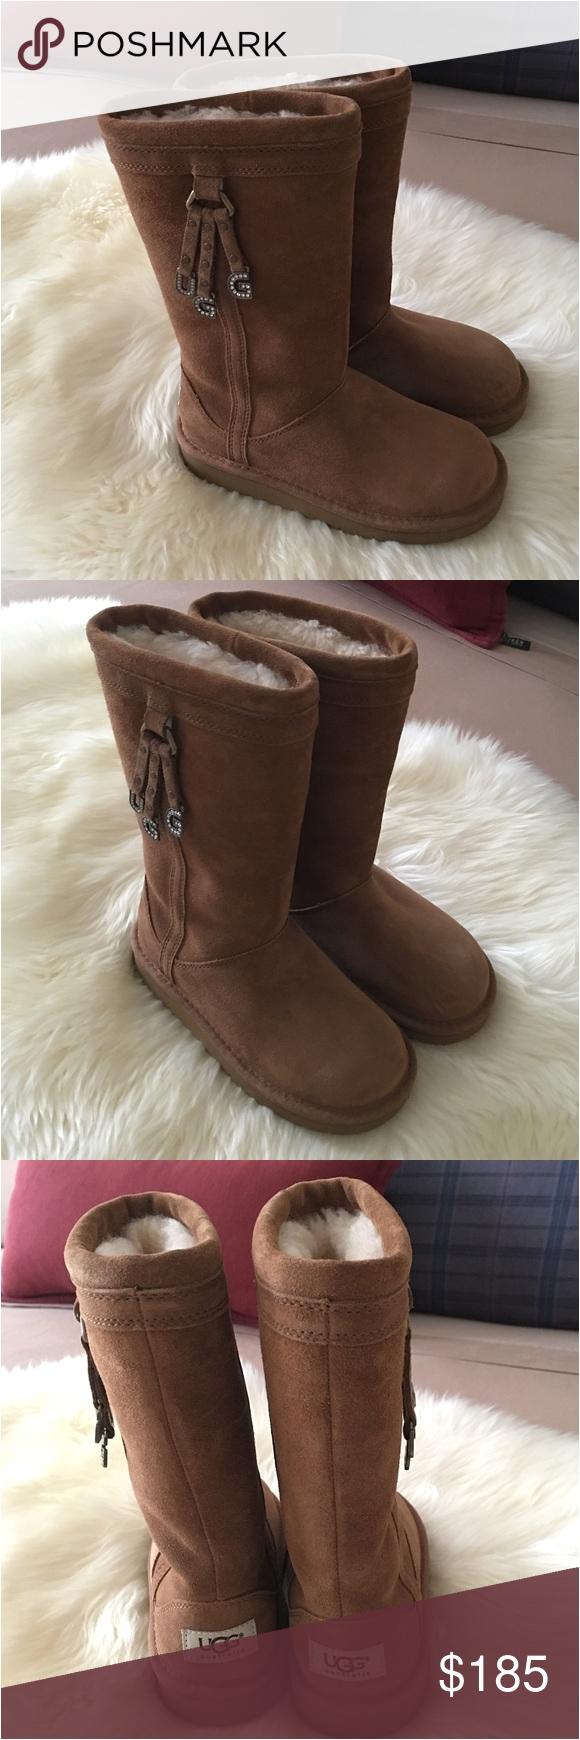 ugg australia kids boots new never worn no box